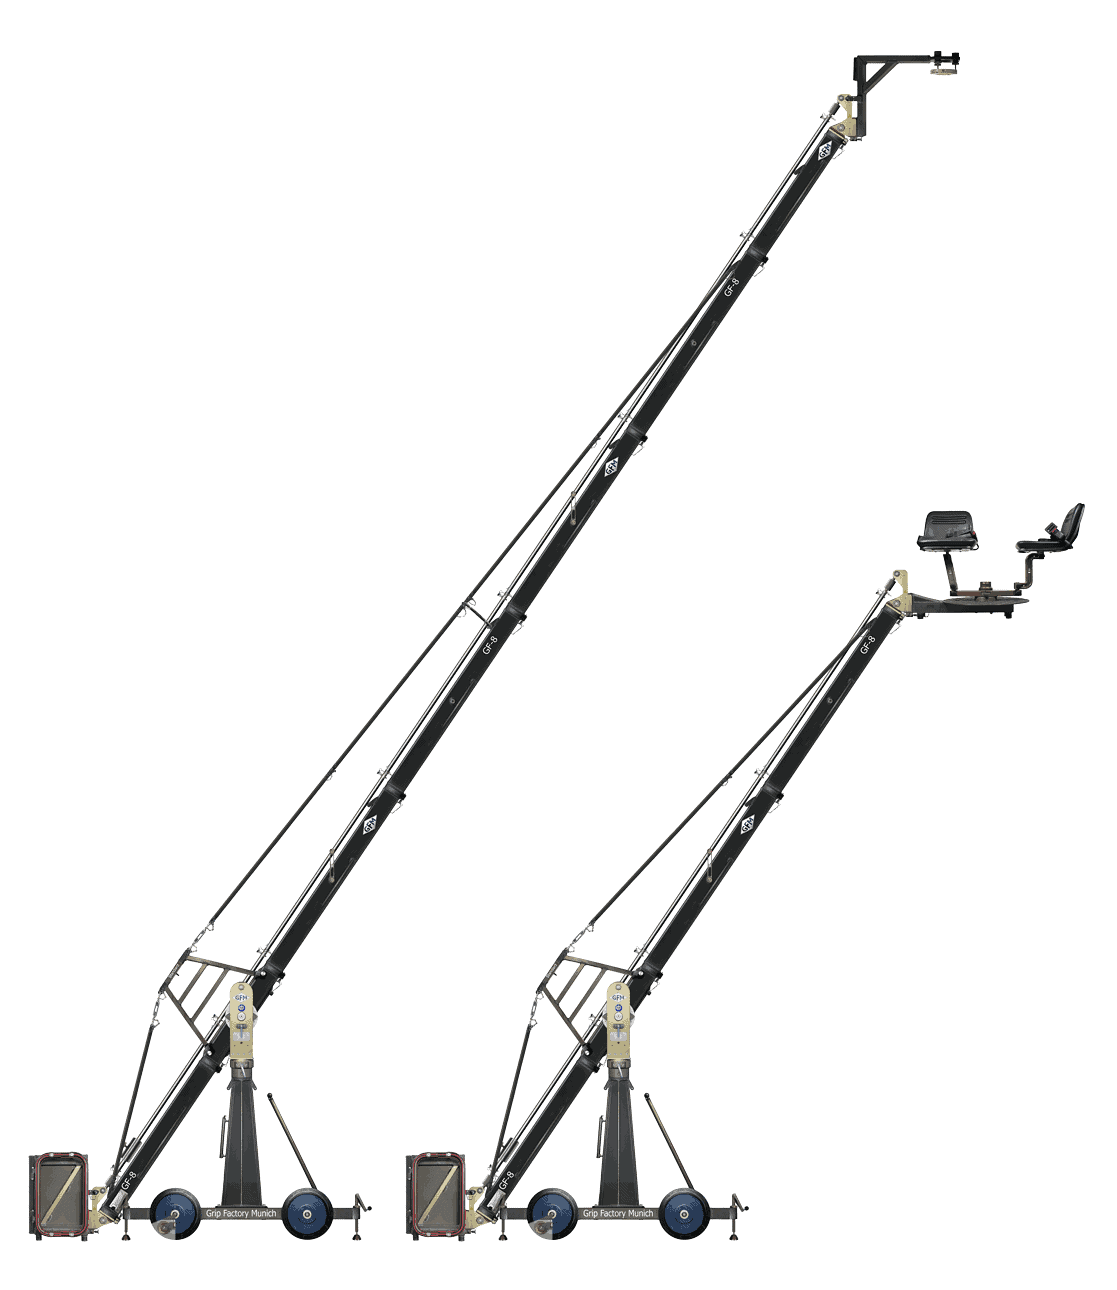 GF-8 Crane